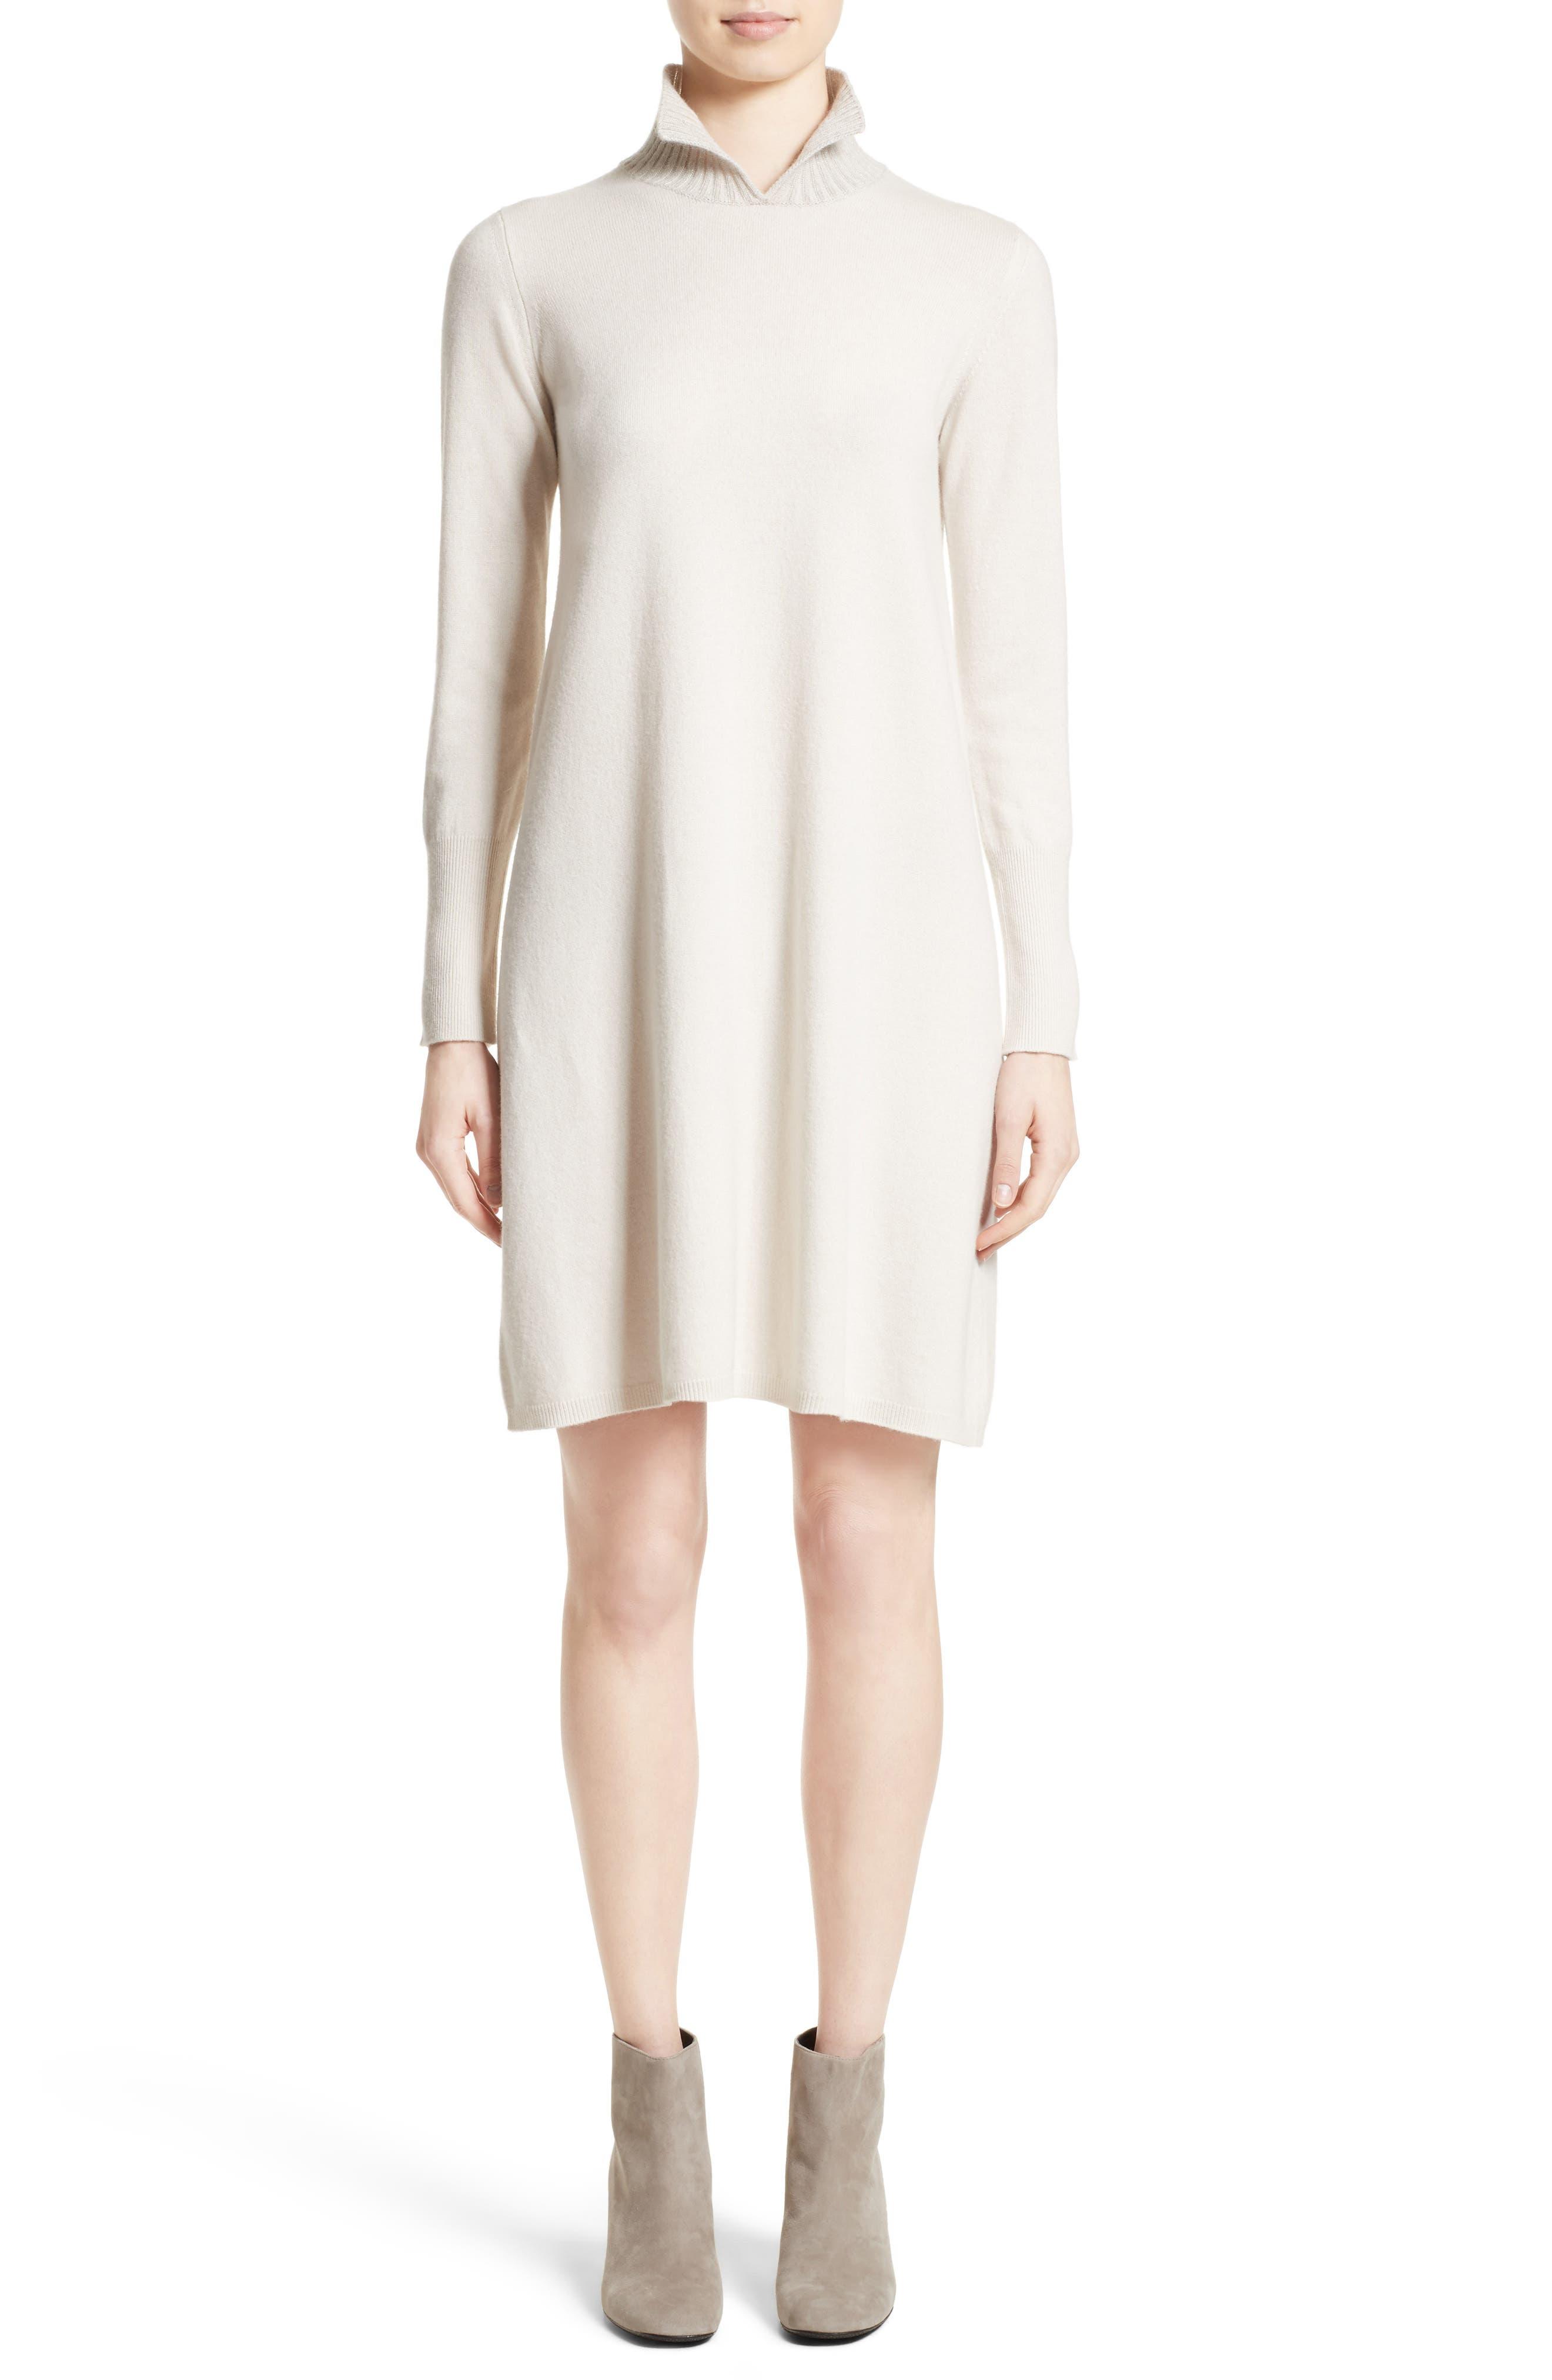 Wool, Silk & Cashmere Knit Dress,                             Main thumbnail 1, color,                             101